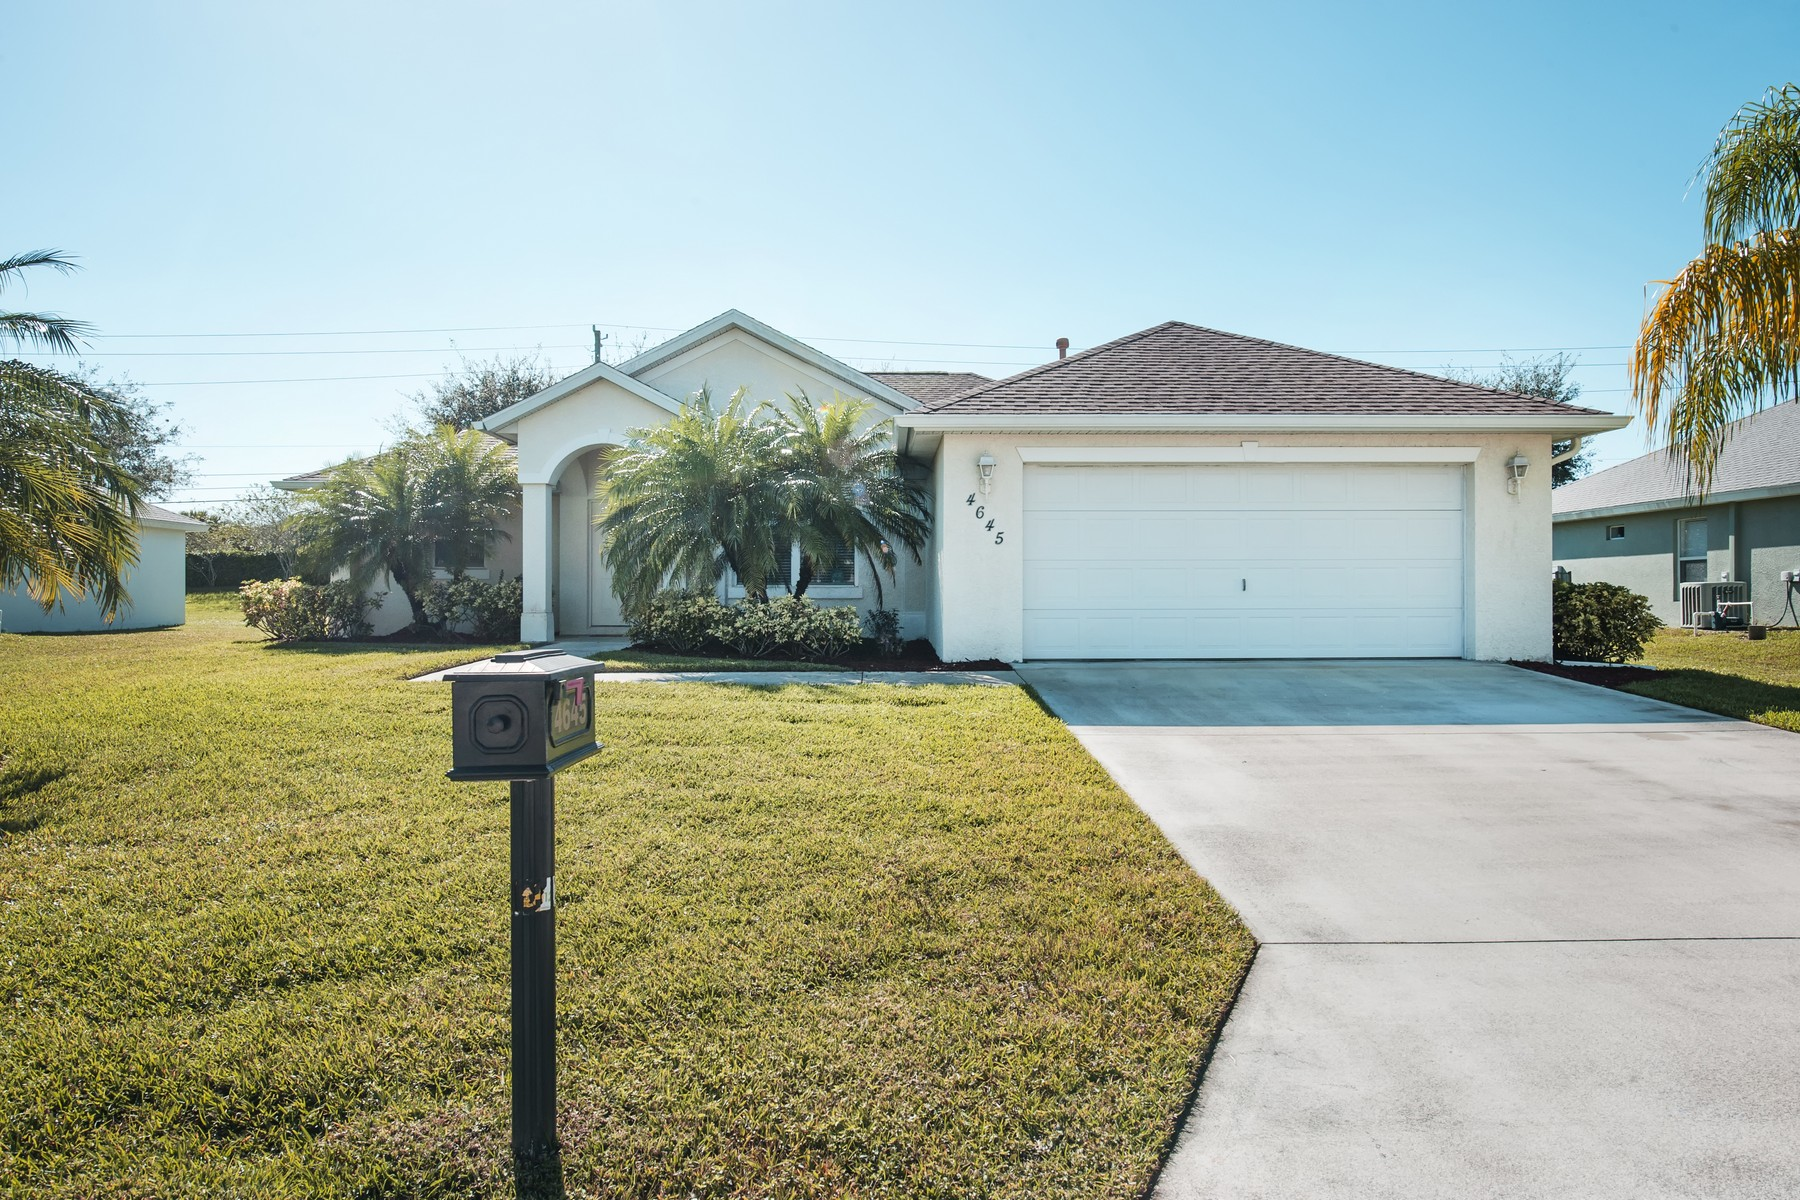 Villa per Vendita alle ore Immaculate & Beautiful Home in Legend Lakes 4645 Stephanie Lane Vero Beach, Florida 32968 Stati Uniti